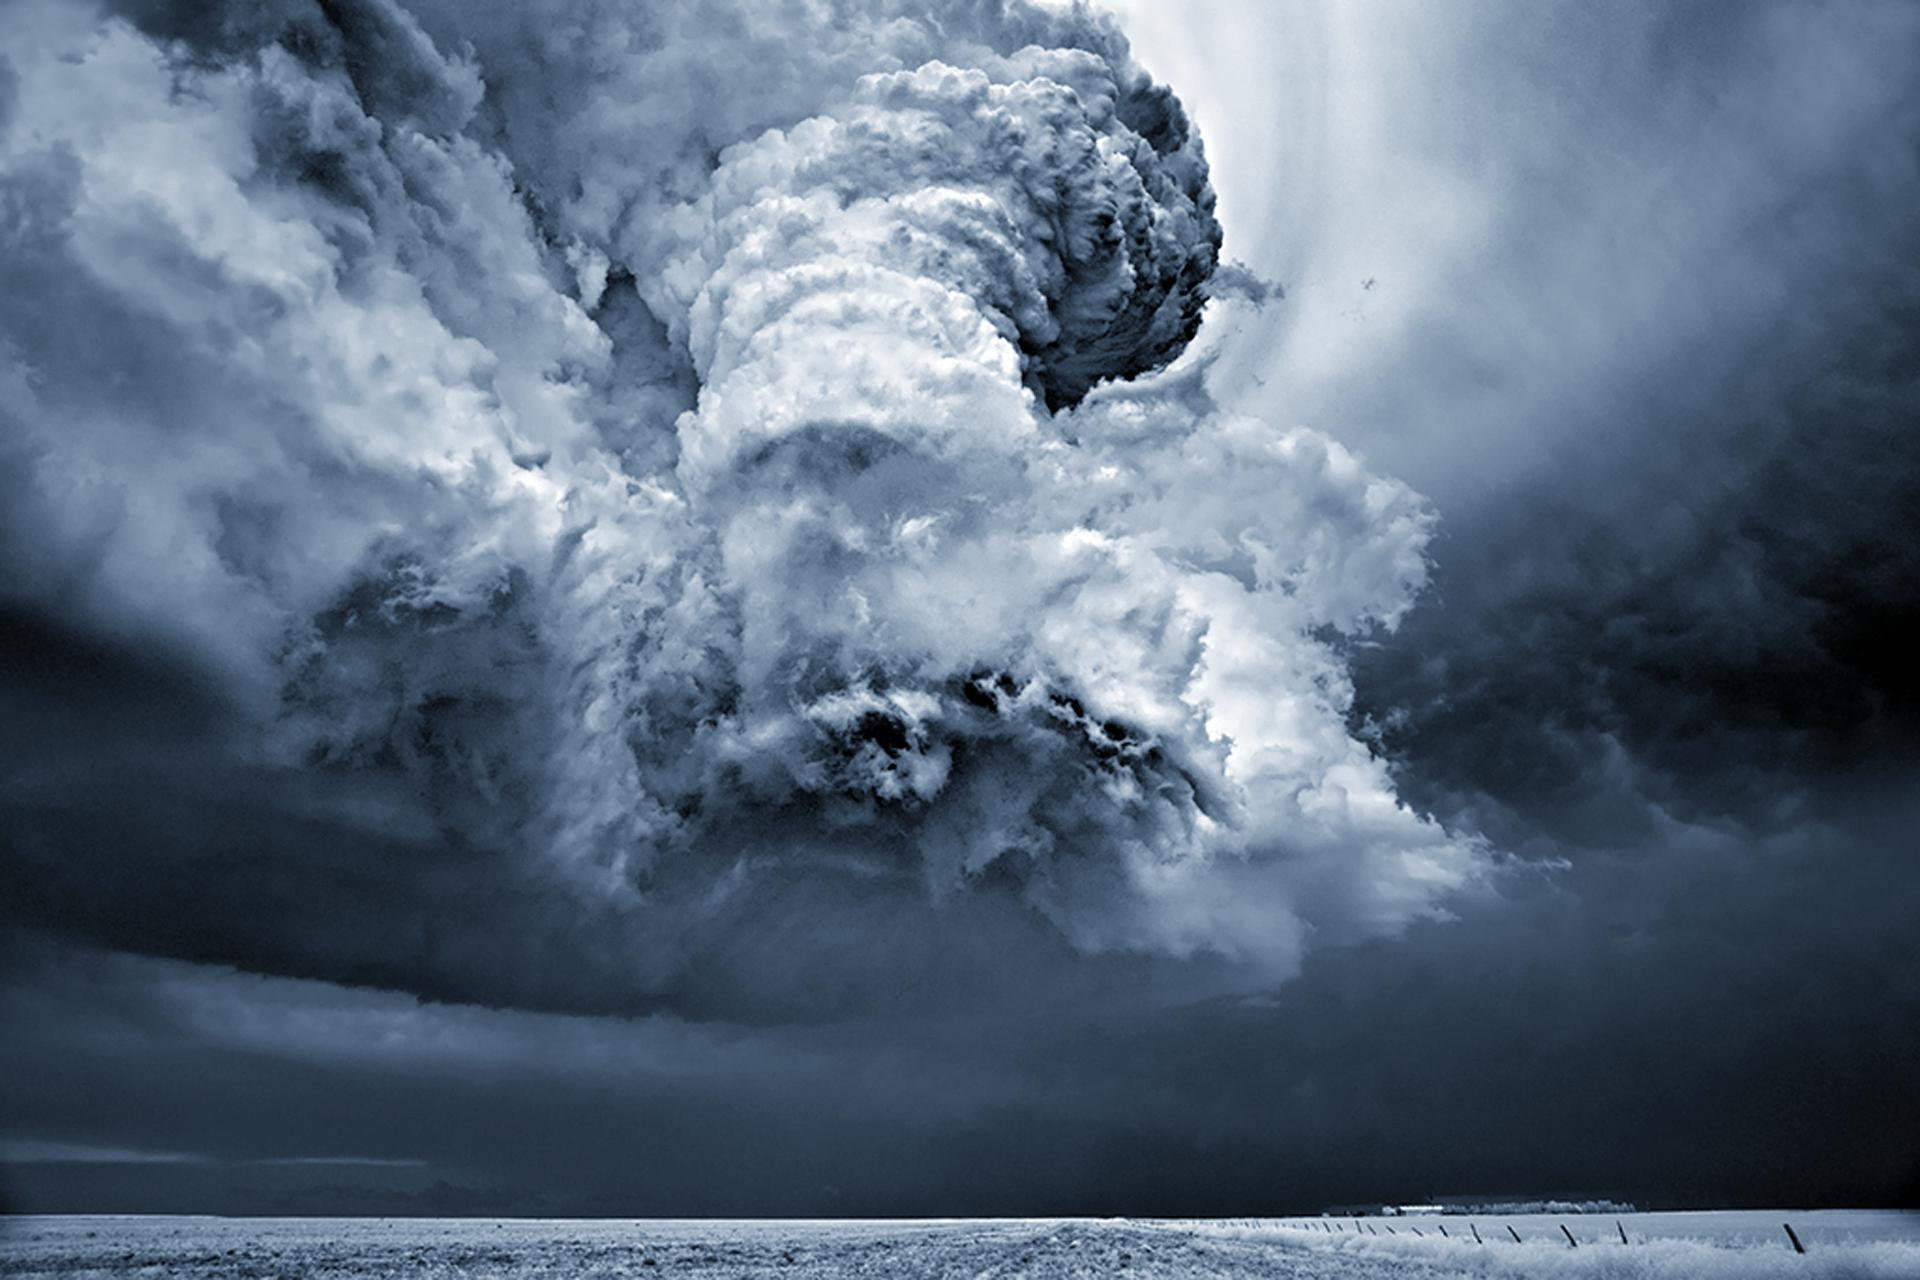 Tornado Wallpaper 25 1920x1280 768x512